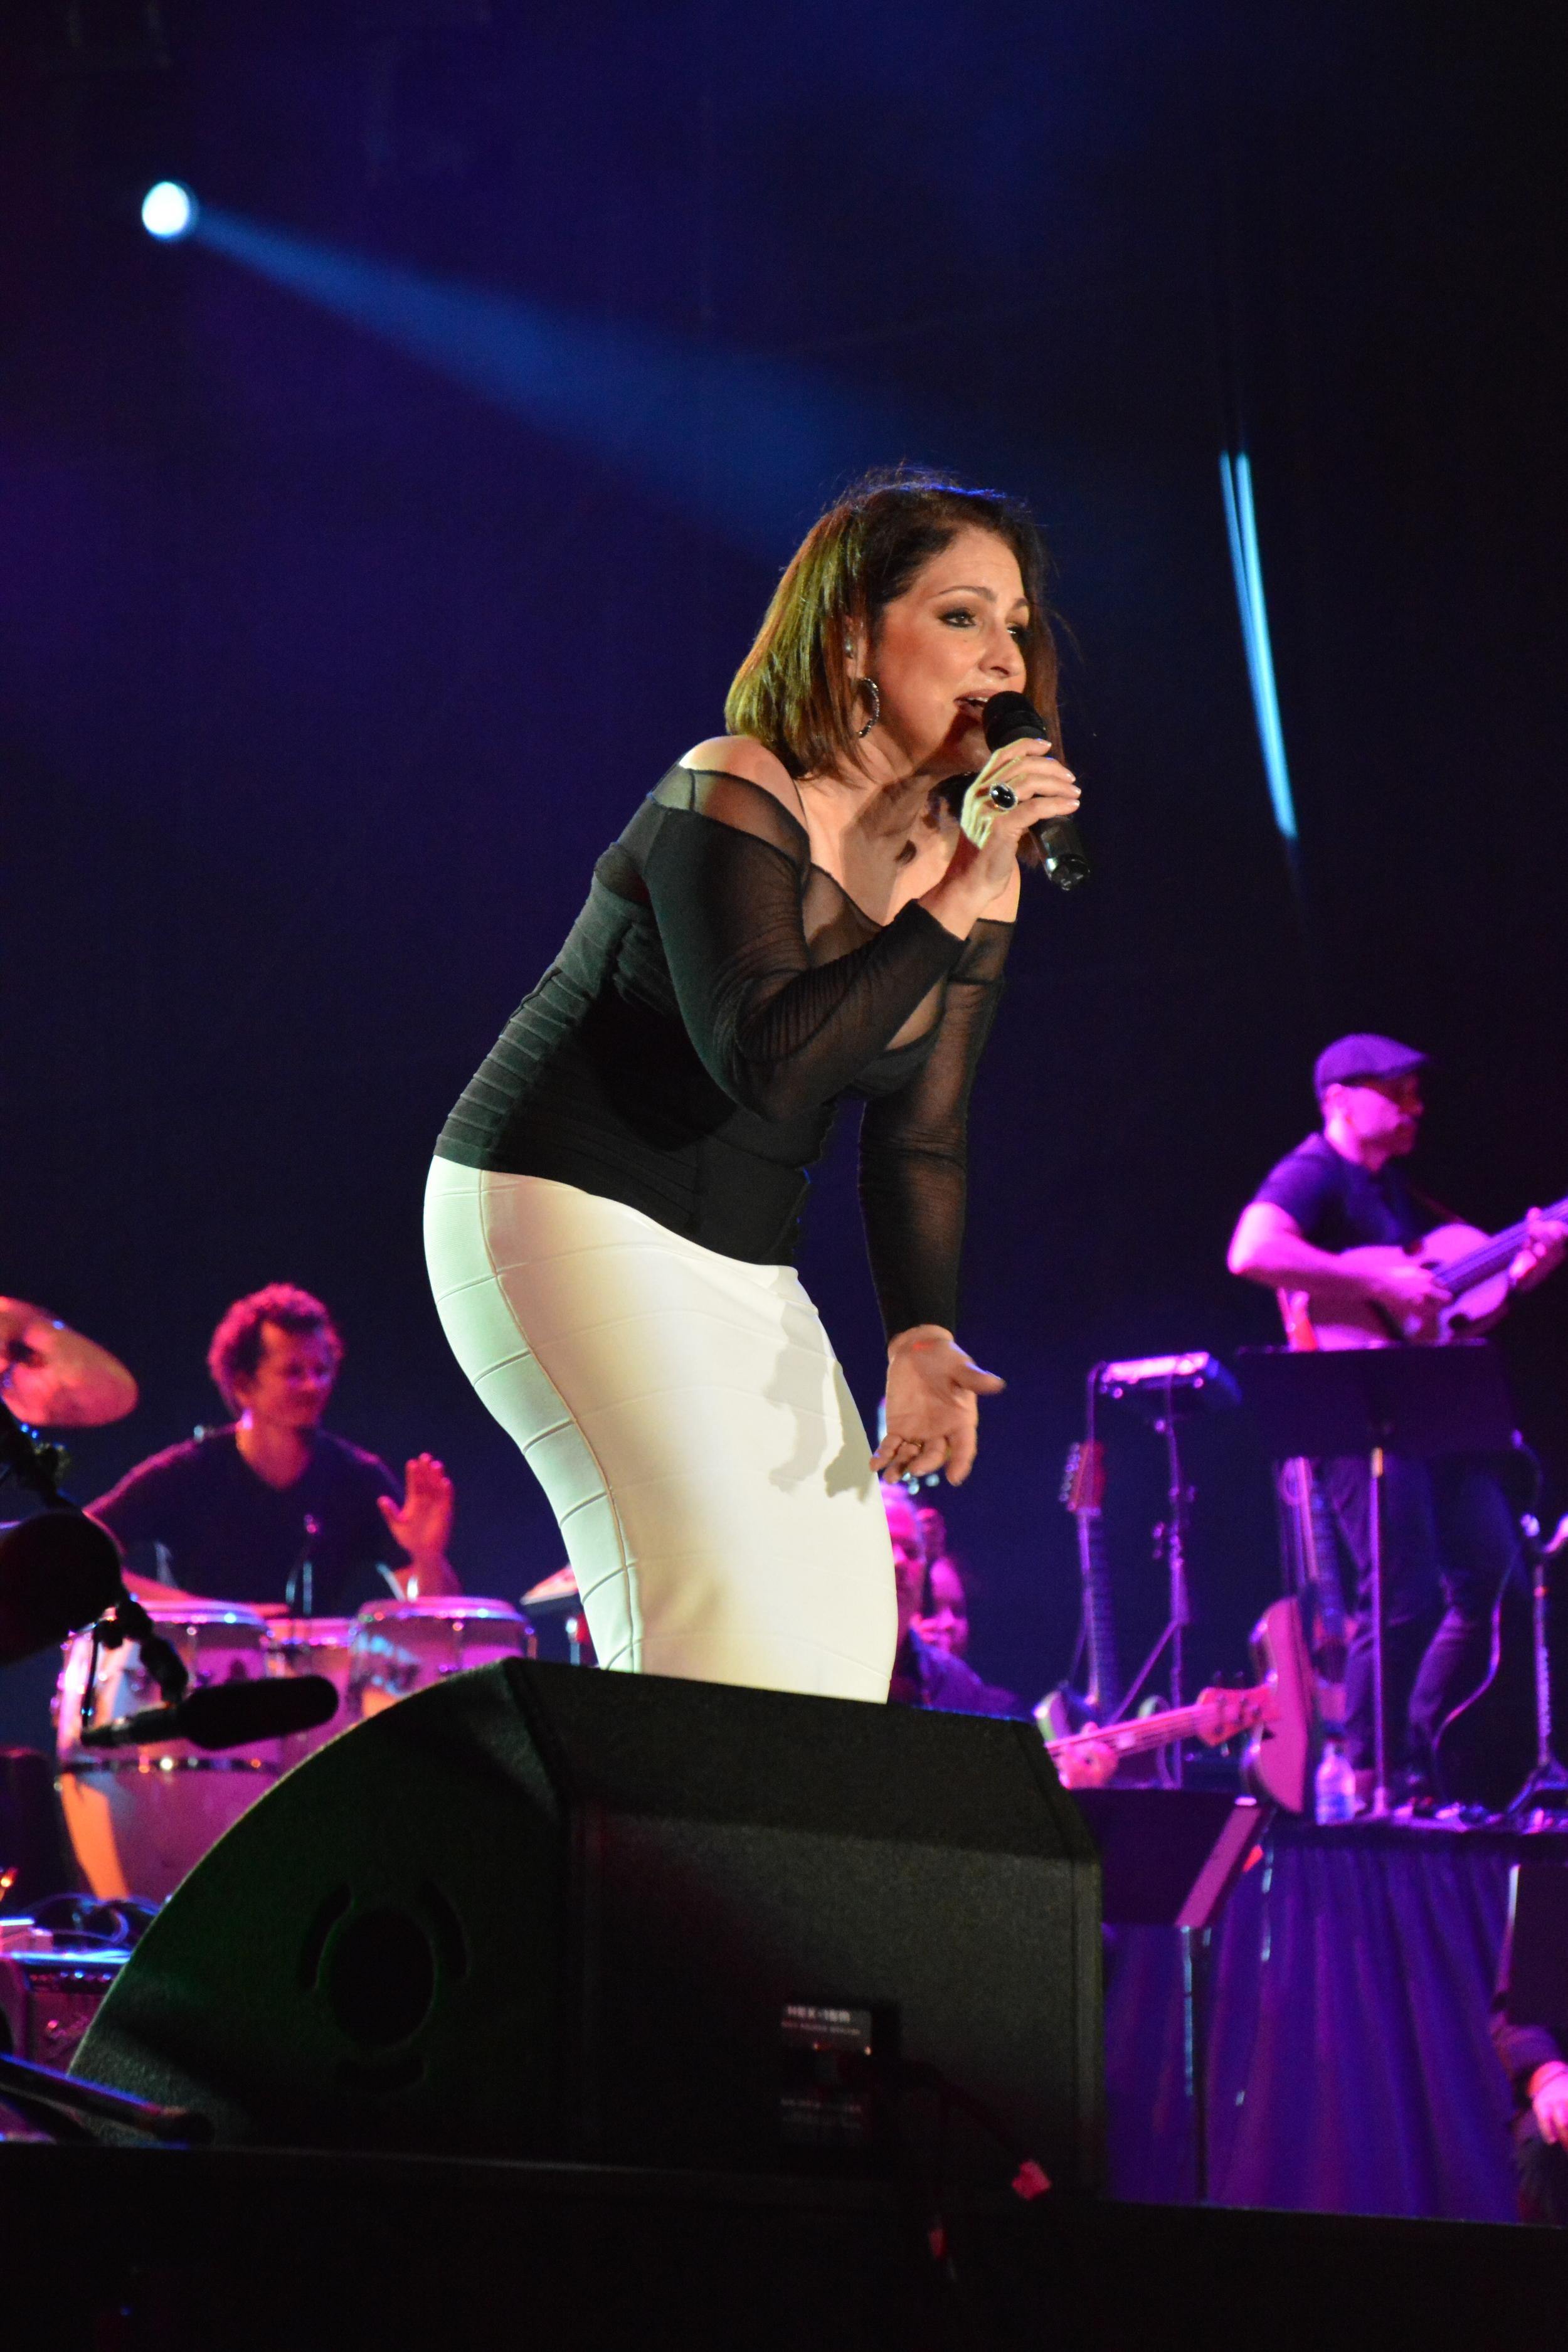 Miami music legend Gloria Estefan moves the crowd